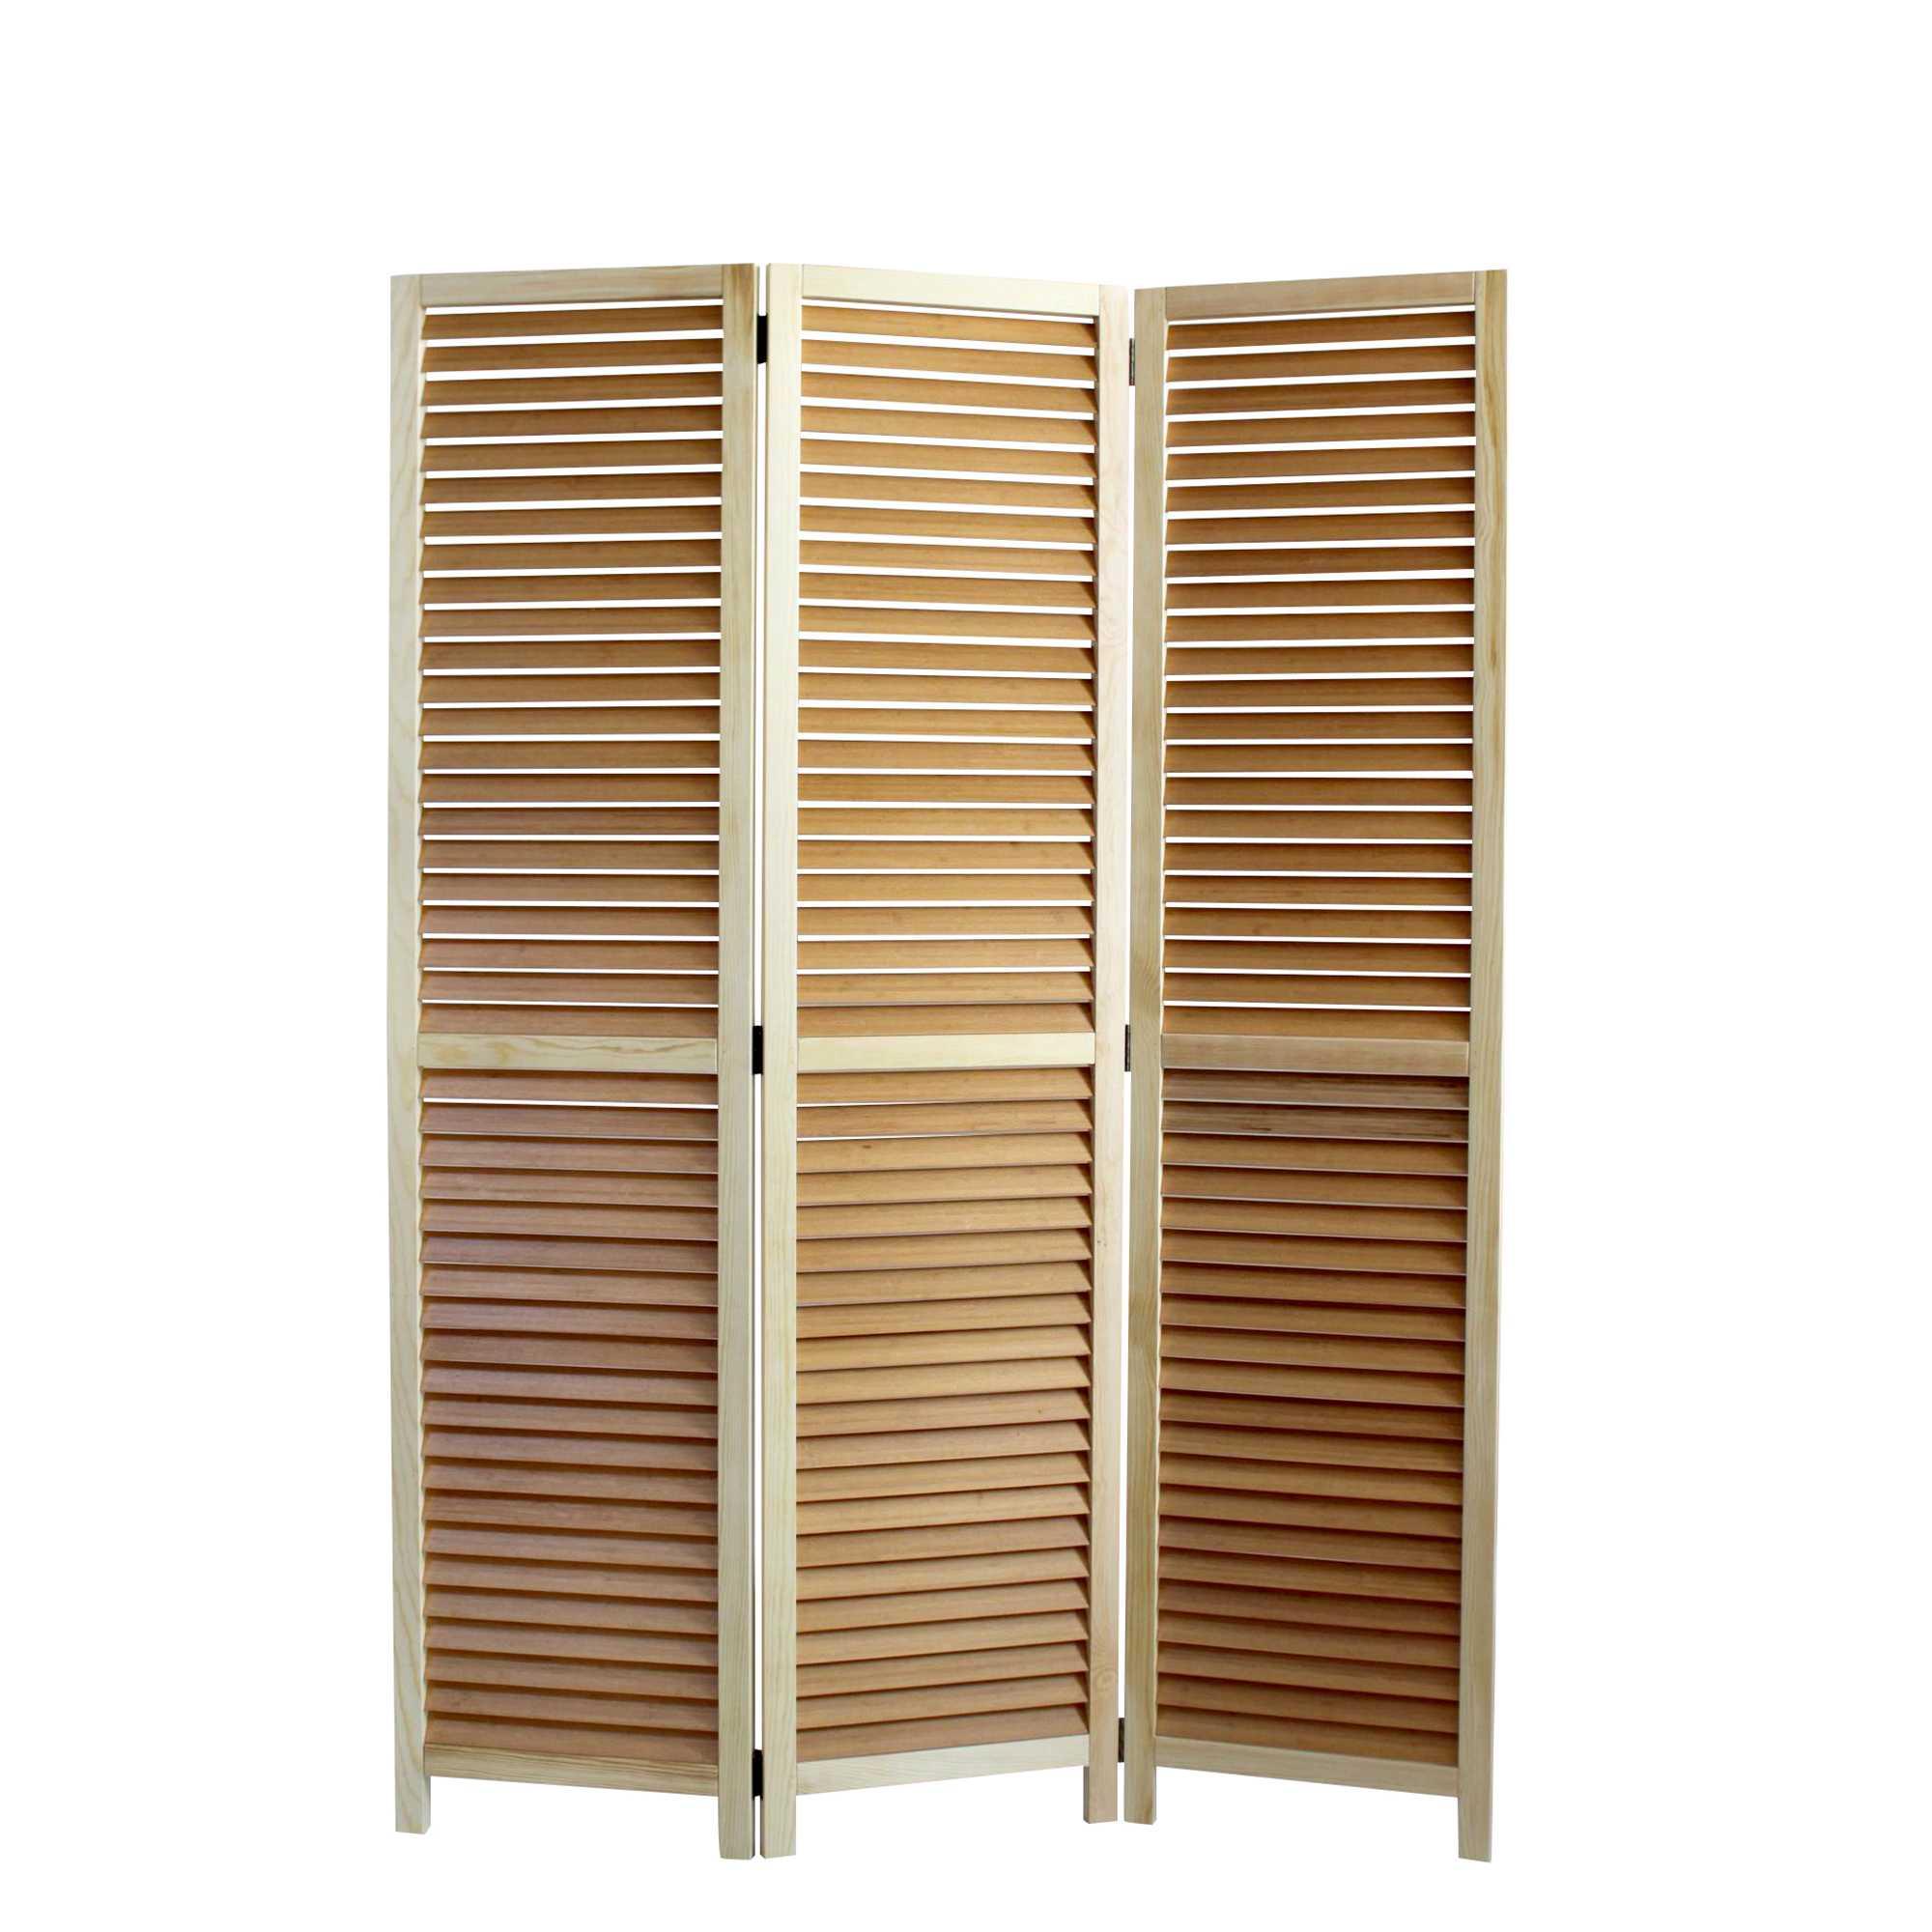 "1"" x 47"" x 67"" Natural Wood  Screen"